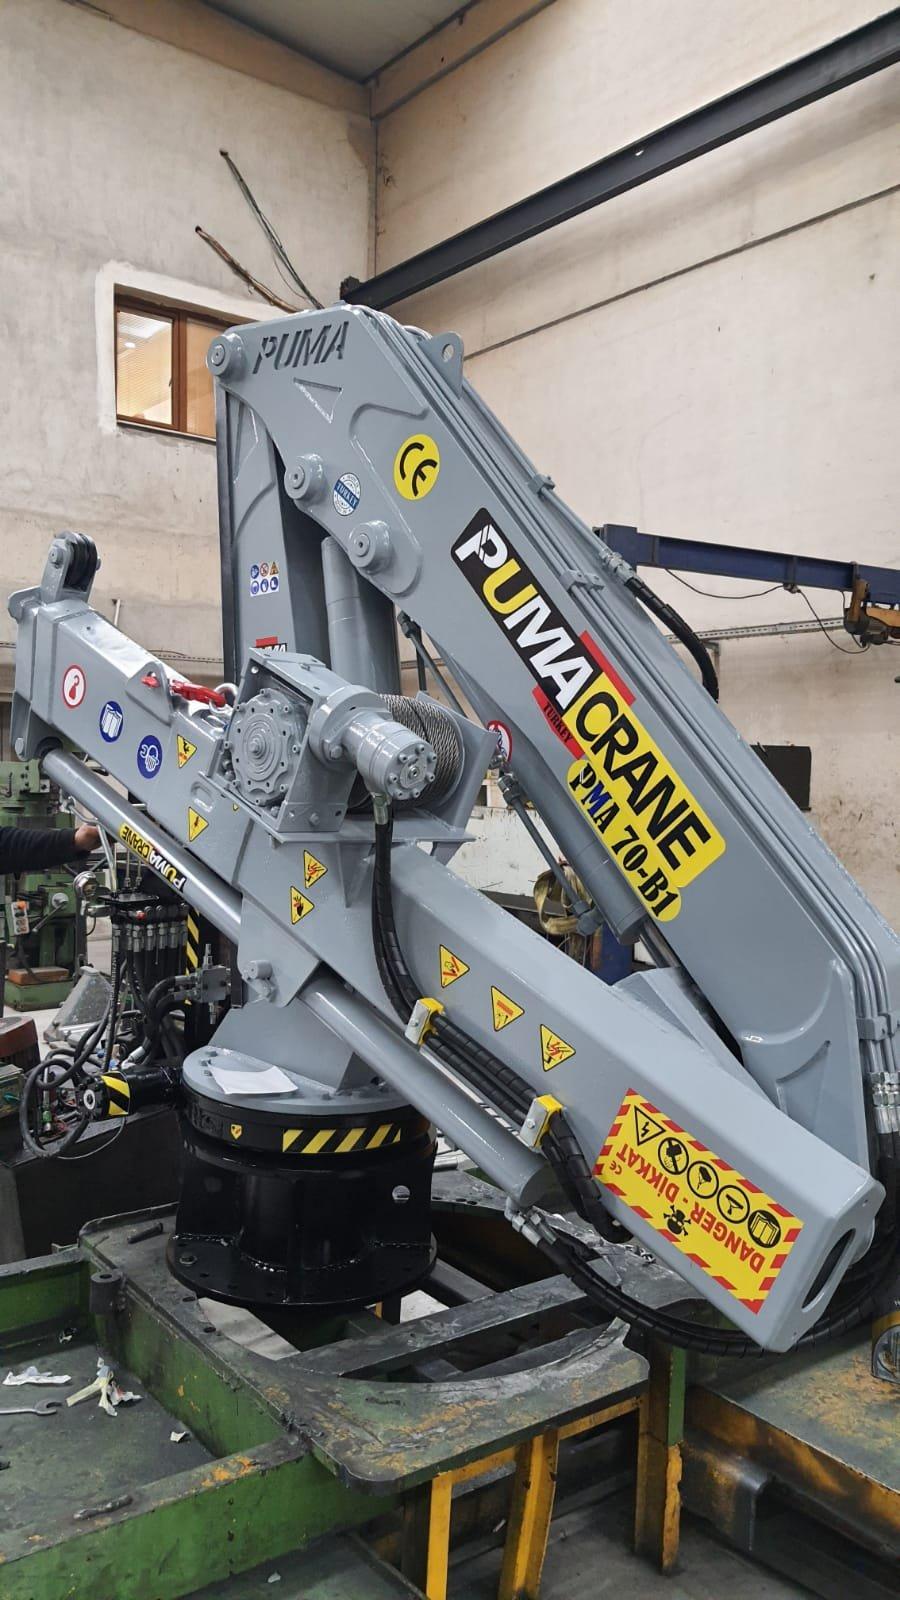 puma-marine-crane733039.jpg